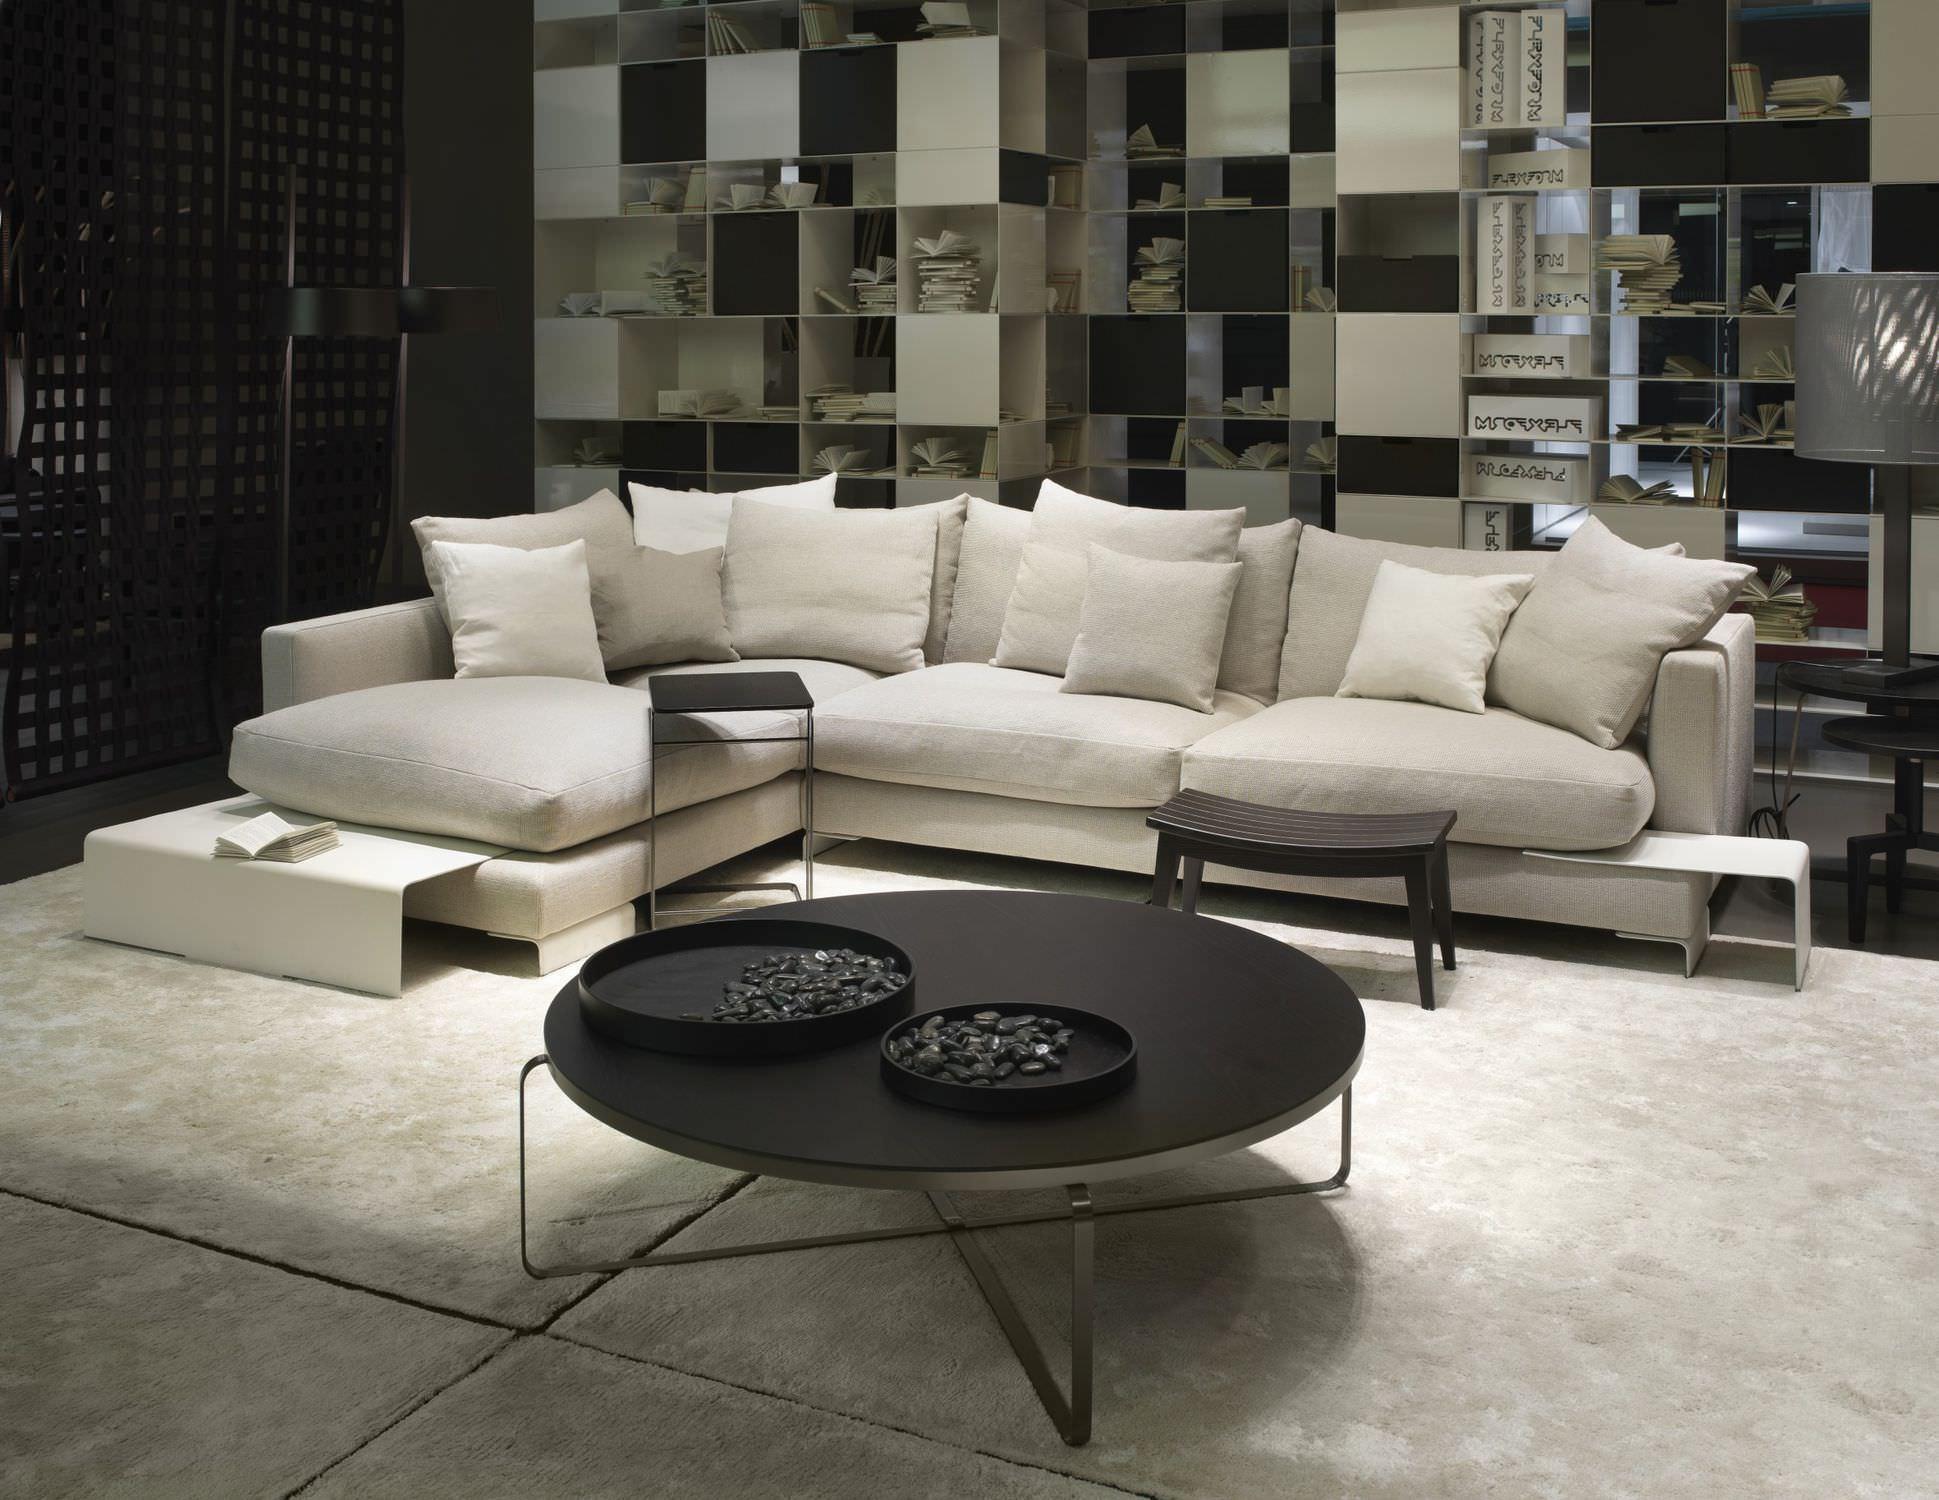 Modular sofa contemporary leather metal LONG ISLAND